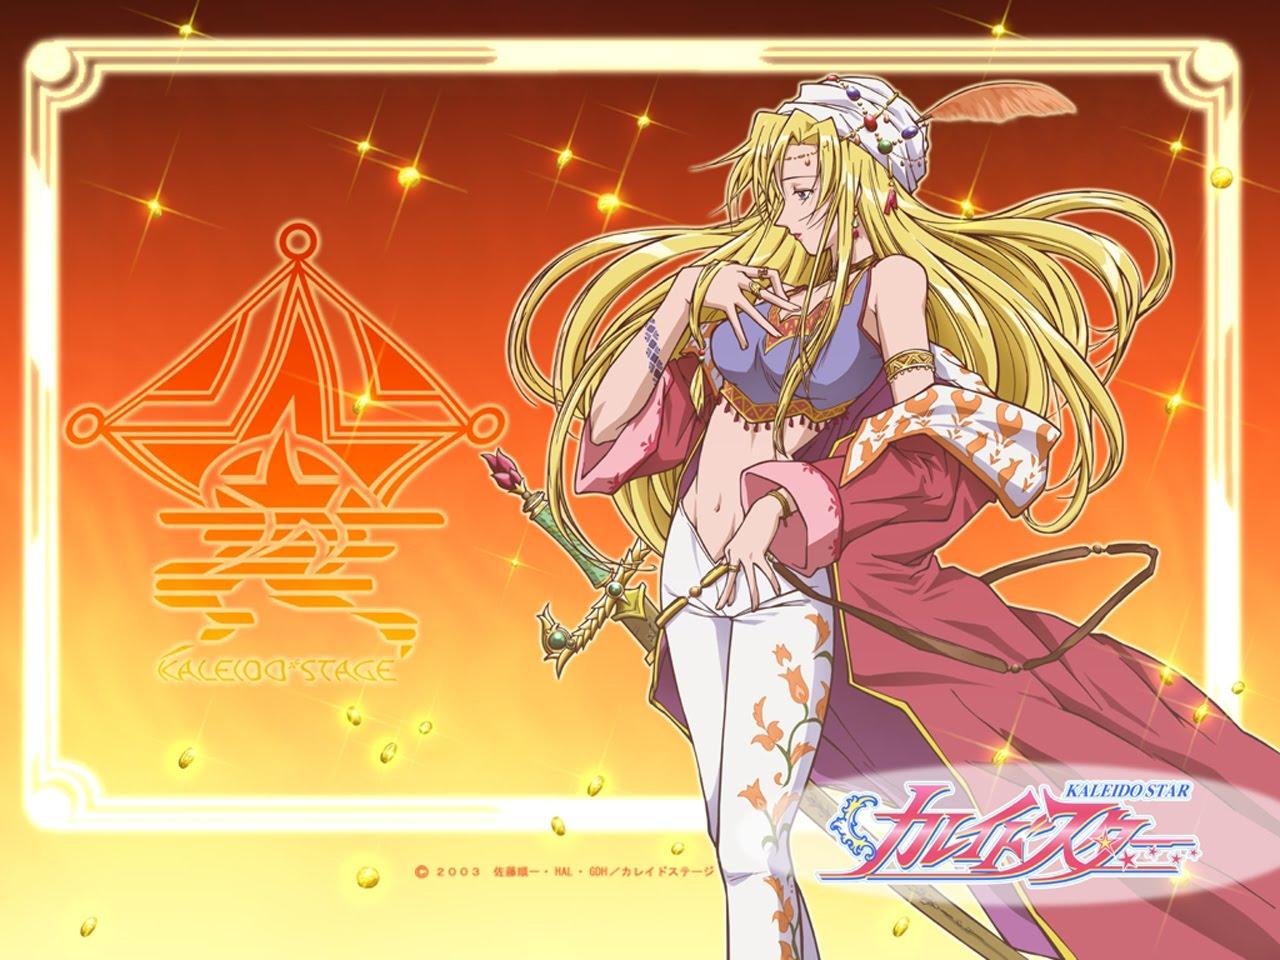 Anime Wallpaper Naruto Shippuden The World Of Anime Kaleido Star